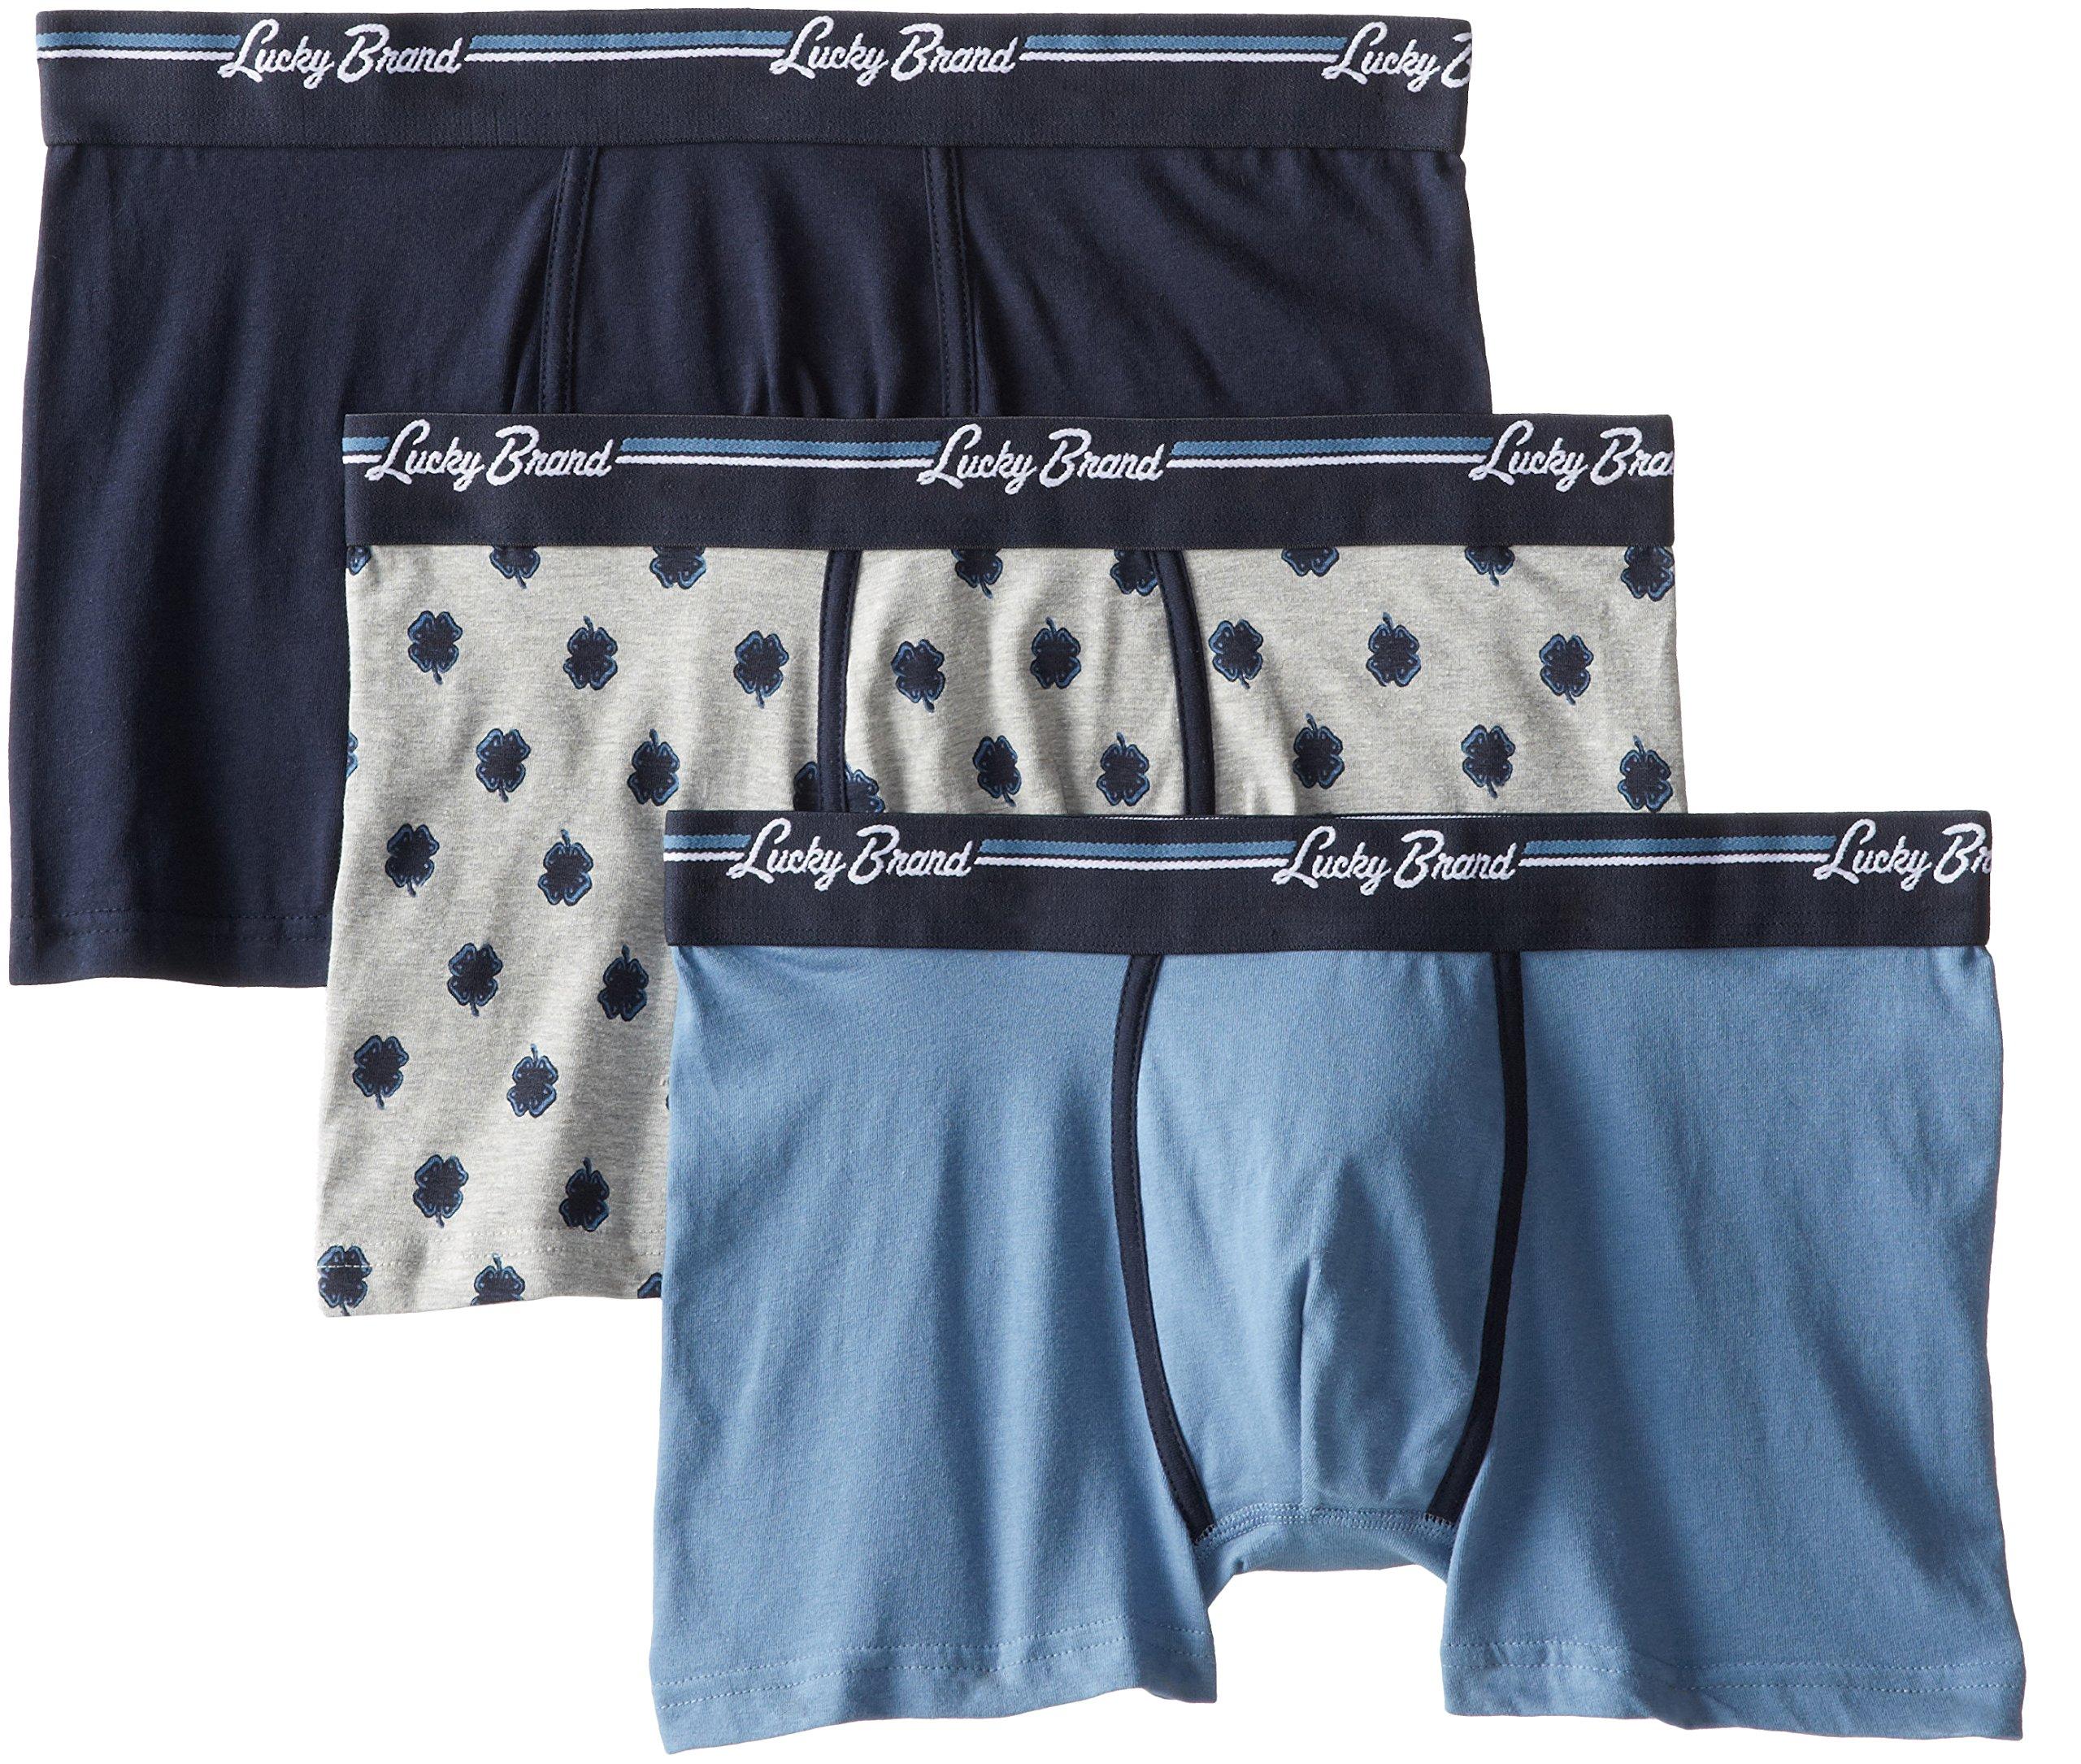 Lucky Brand Men's 3-Pack Assorted Stretch Trunks, Dark Sapphire/Heather Grey/Copen Blue, X-Large